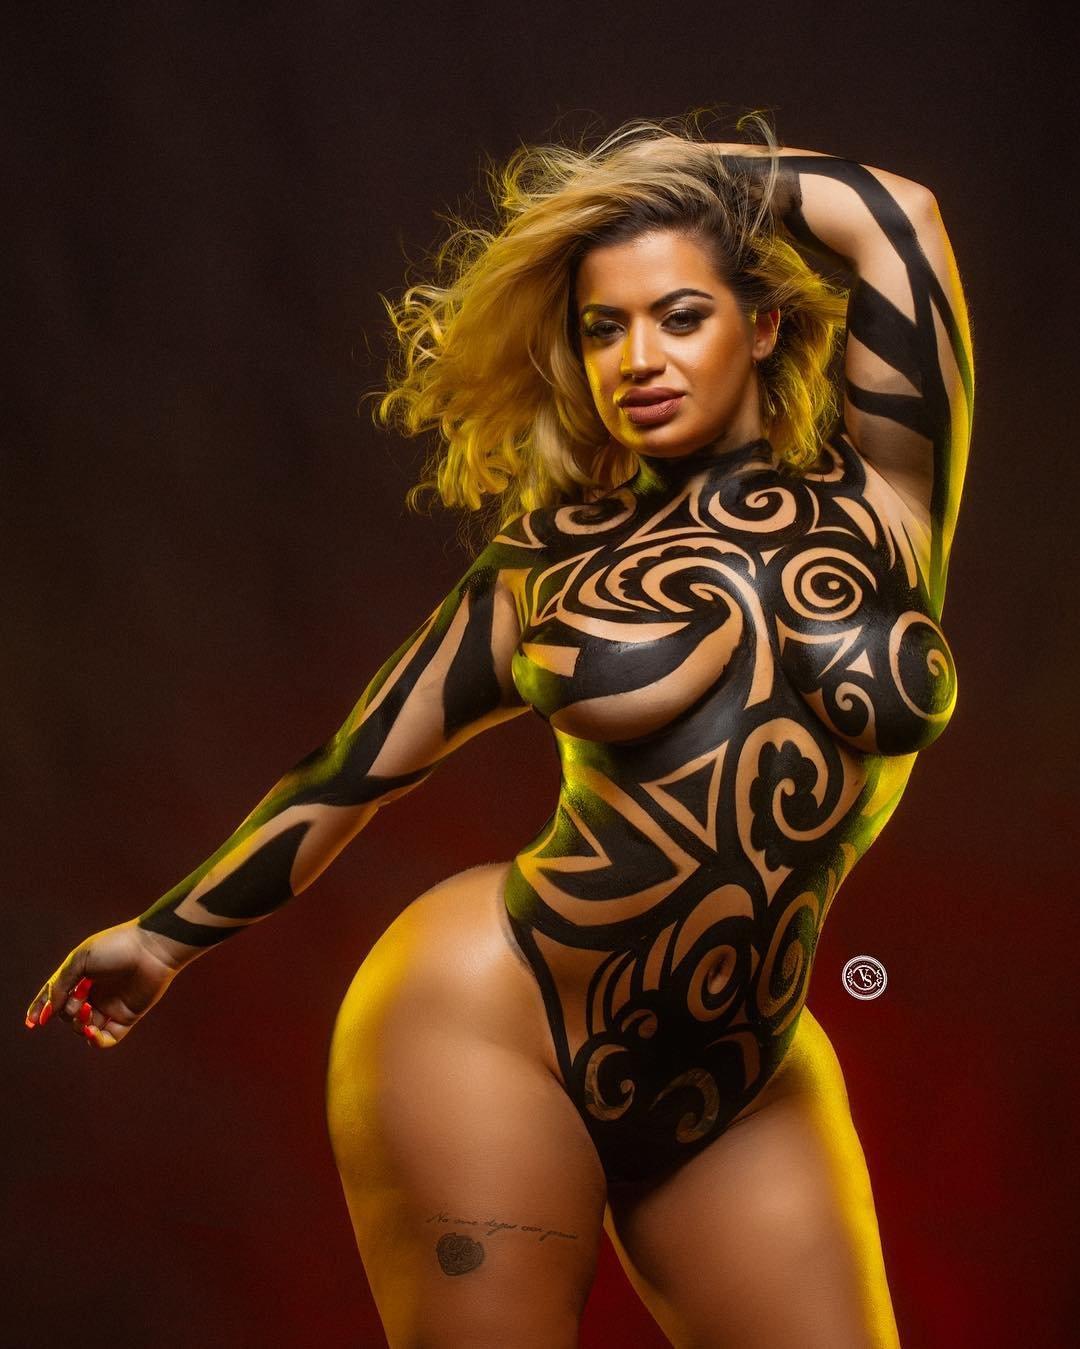 Miami heat naked girls body paint, dab uk market penetration